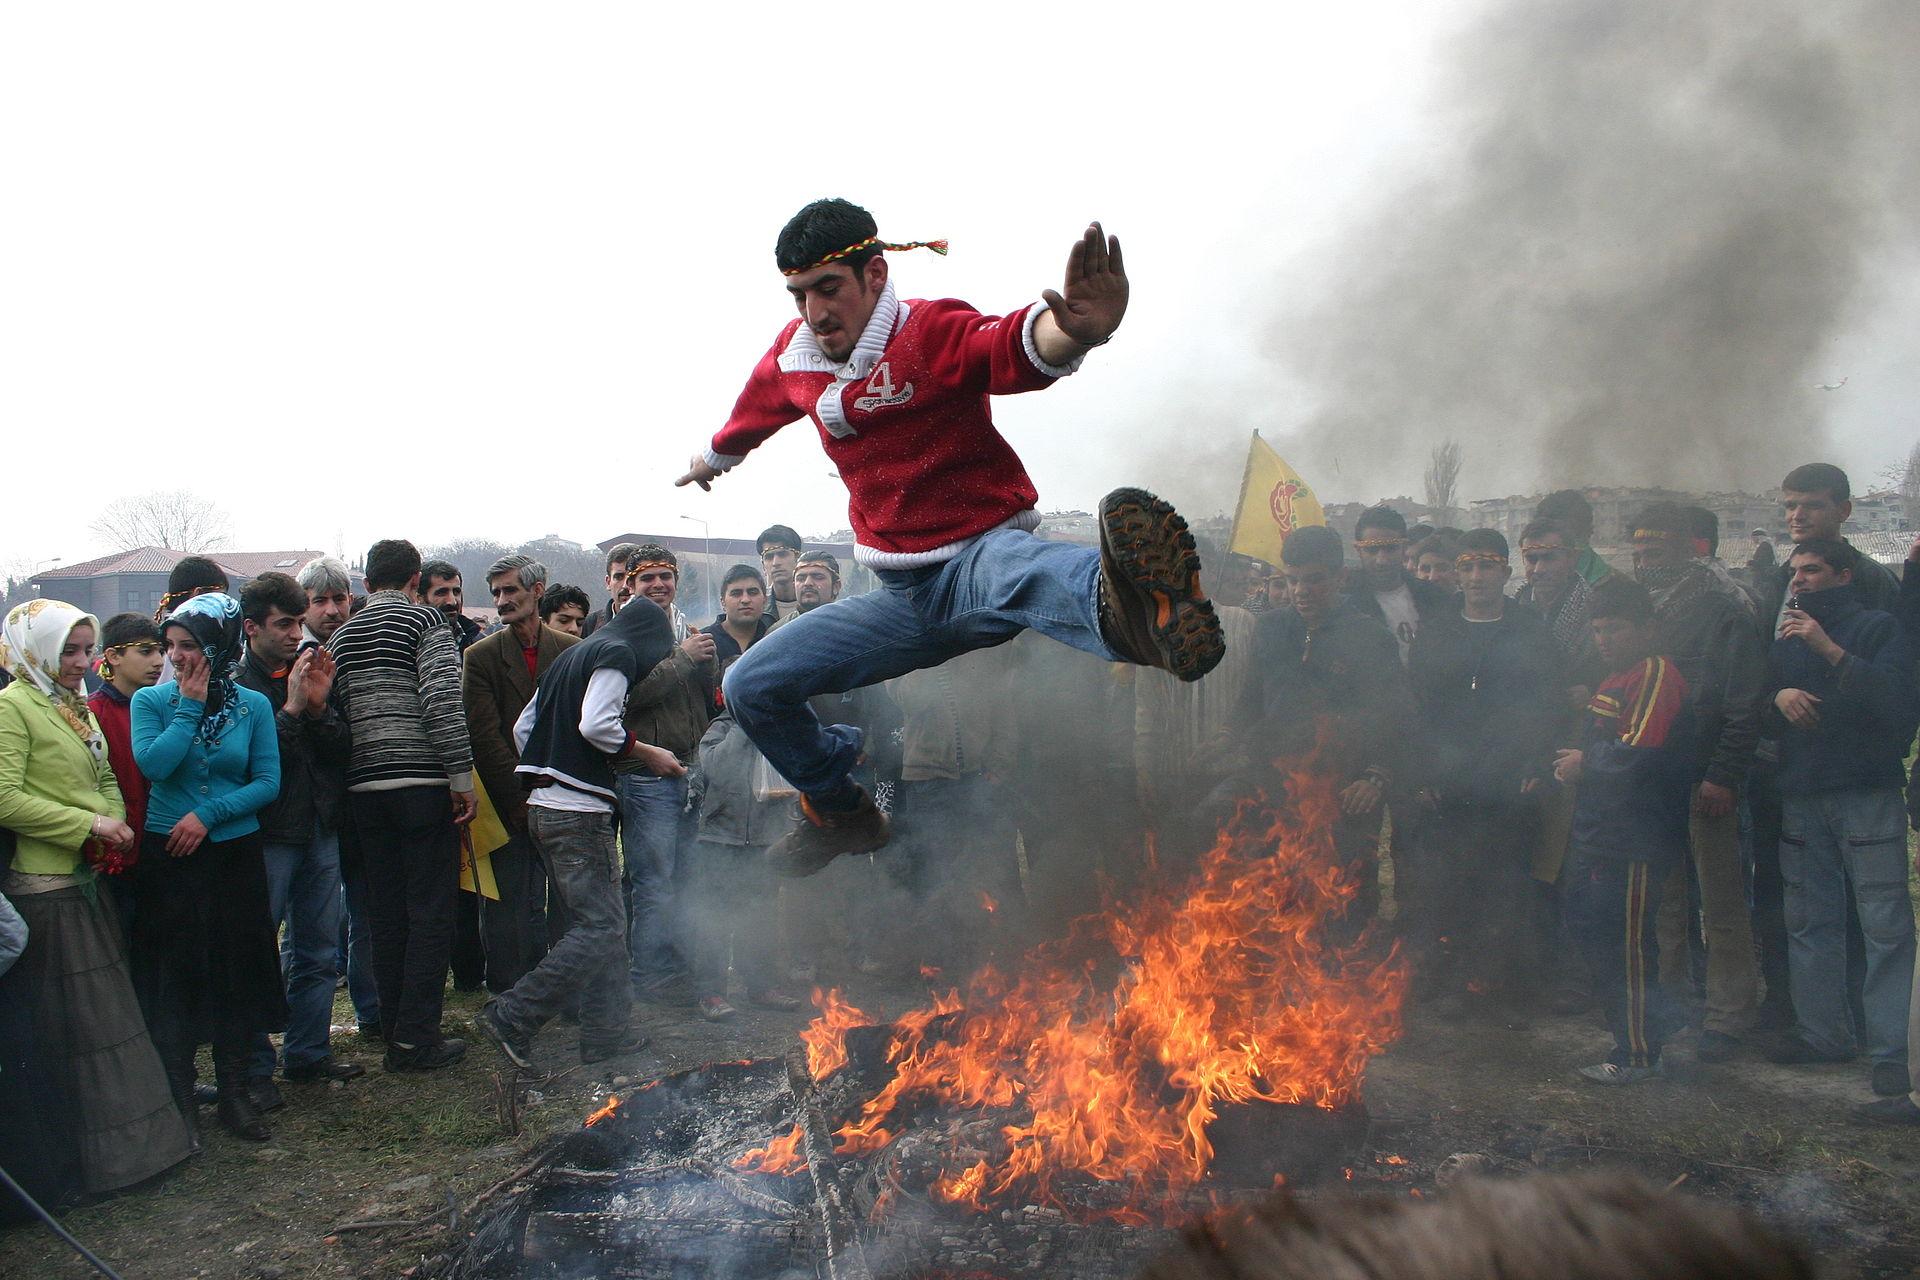 https://upload.wikimedia.org/wikipedia/commons/thumb/7/73/Newroz_Istanbul%284%29.jpg/1920px-Newroz_Istanbul%284%29.jpg